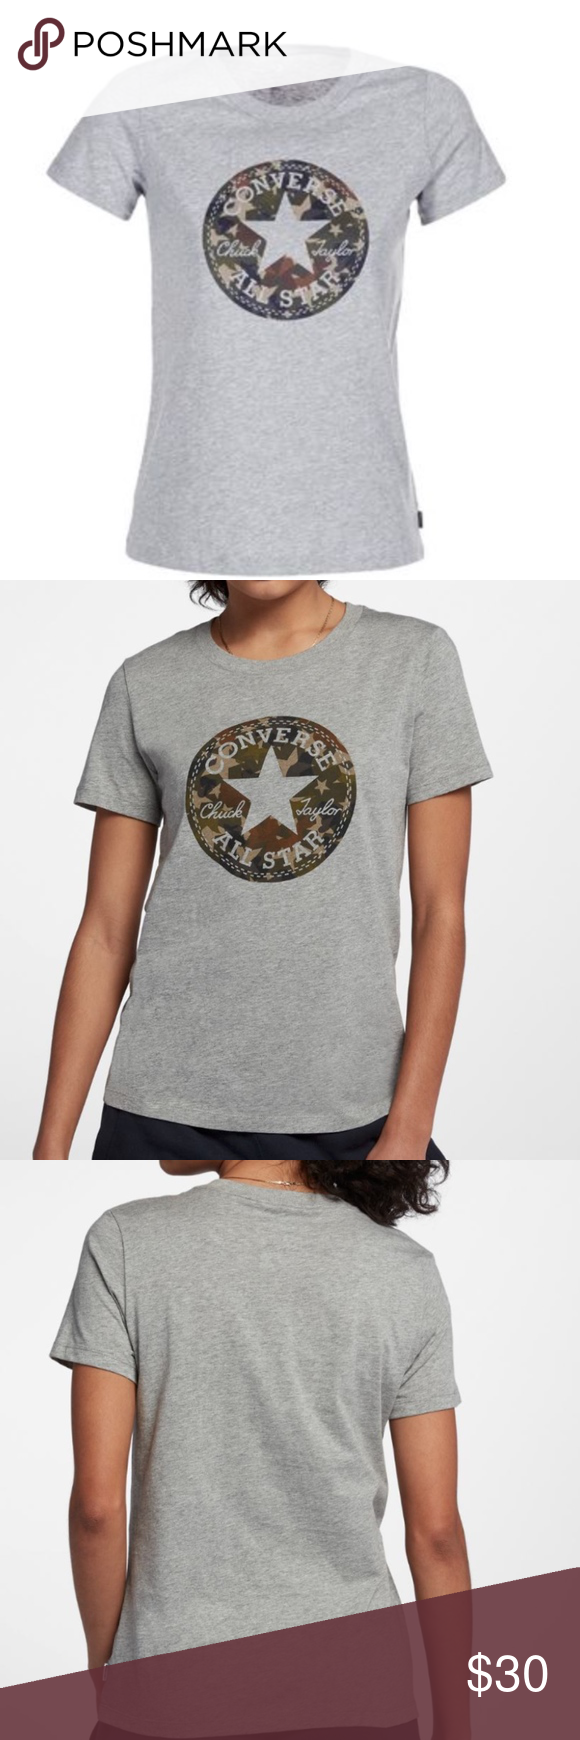 6d612054bd9e NWT Camo Converse Chuck All Star Patch T-Shirt - Brand new - Camouflage  Camo Chuck Patch - 100% cotton Converse Tops Tees - Short Sleeve